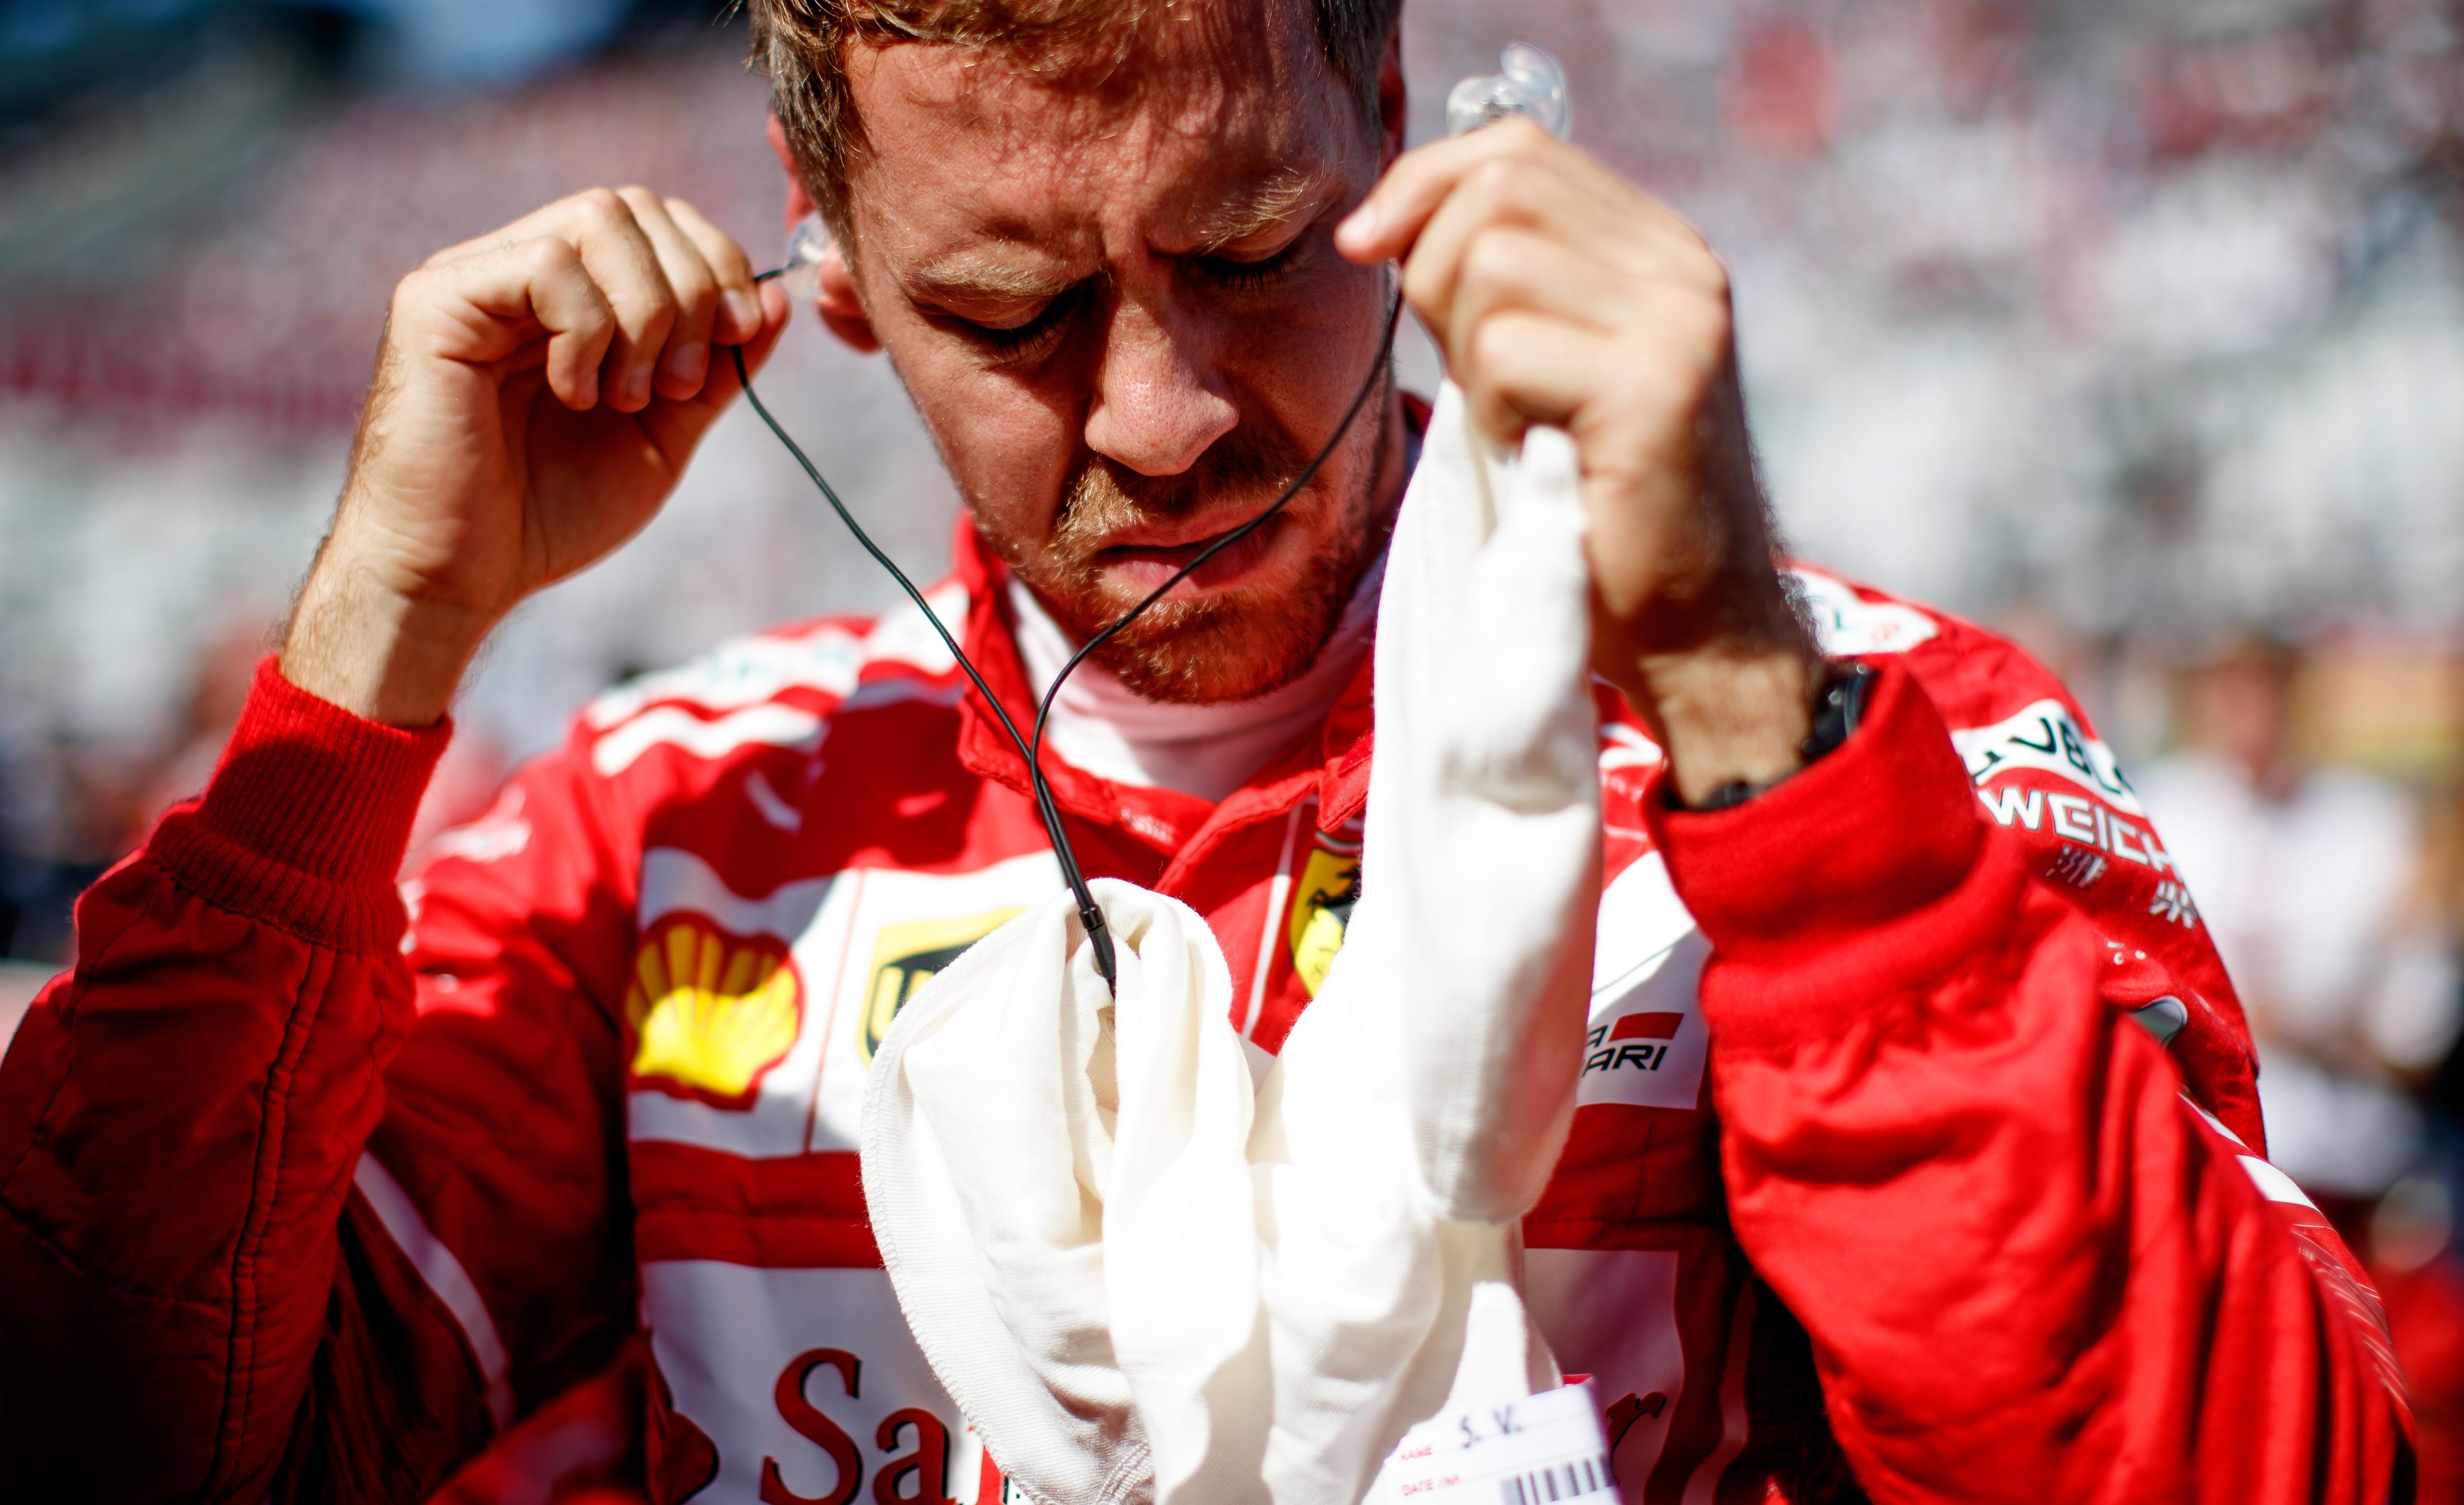 Sebastian Vettel (Ferrari) au Grand Prix du Japon 2017